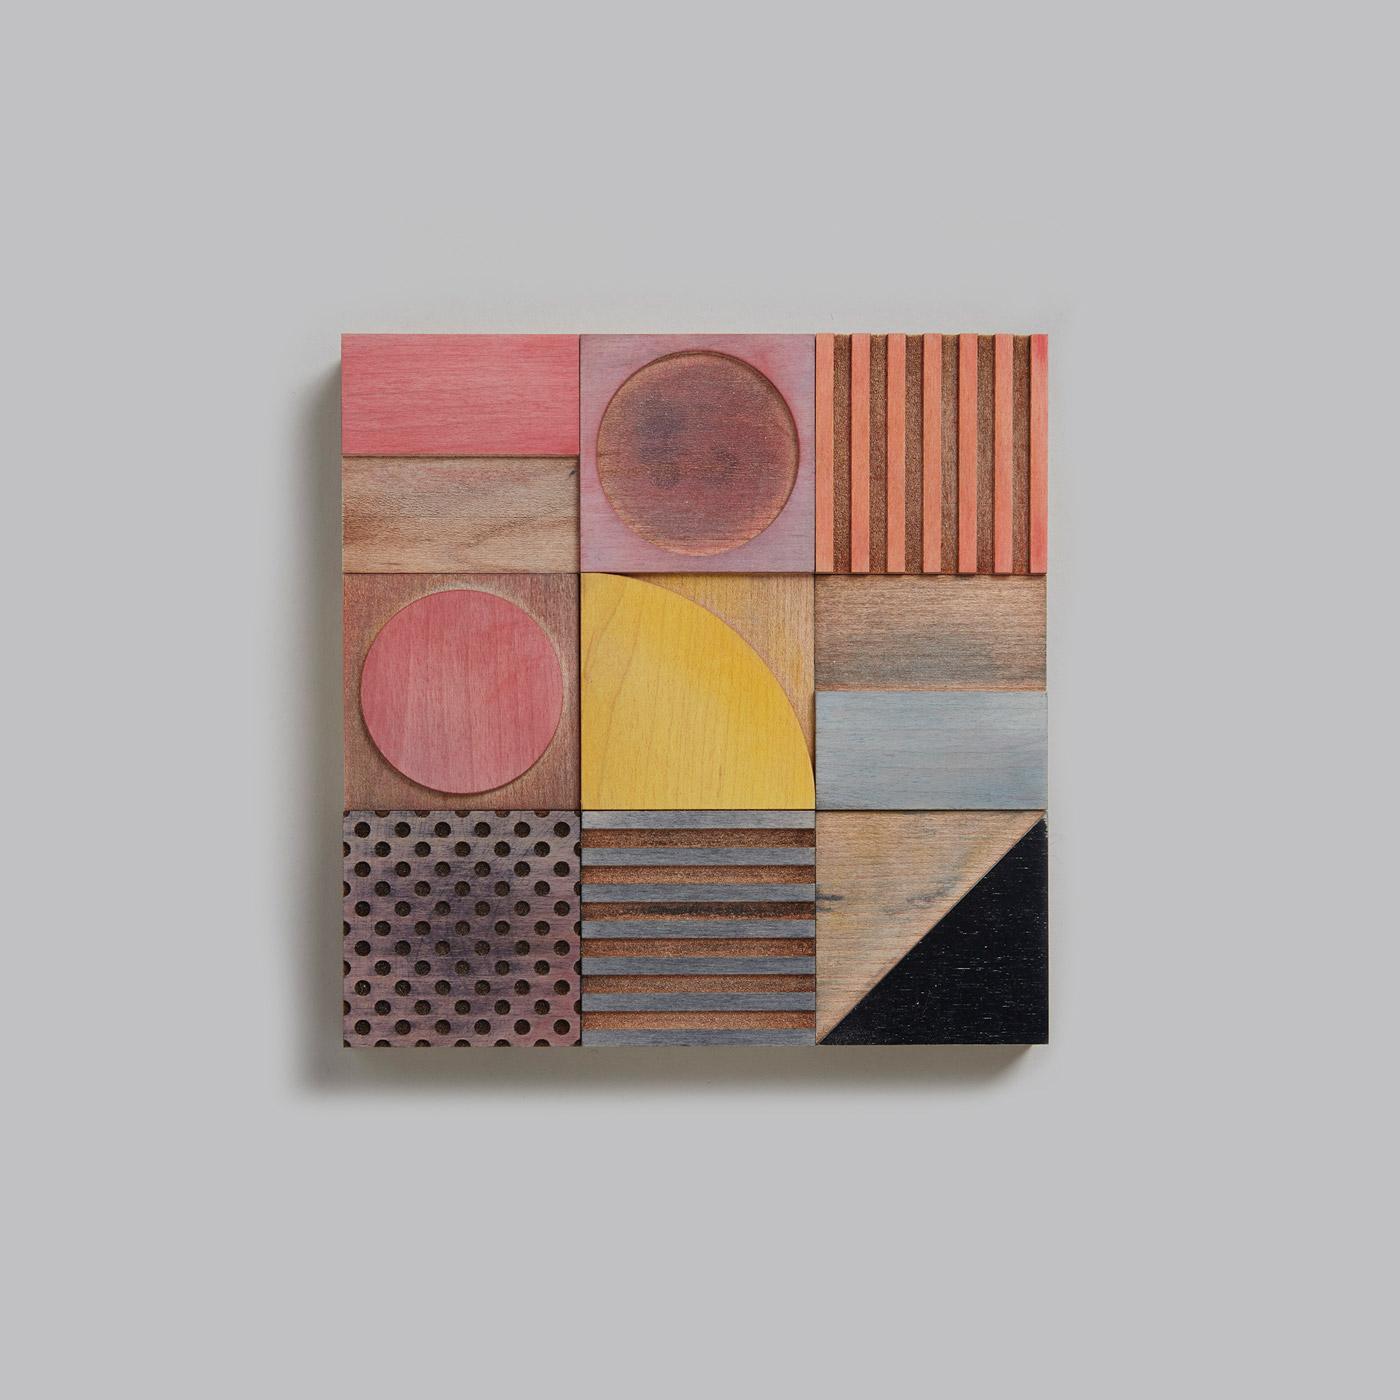 handcraft-series-thomas-mayo-goodfromyou-18.jpg